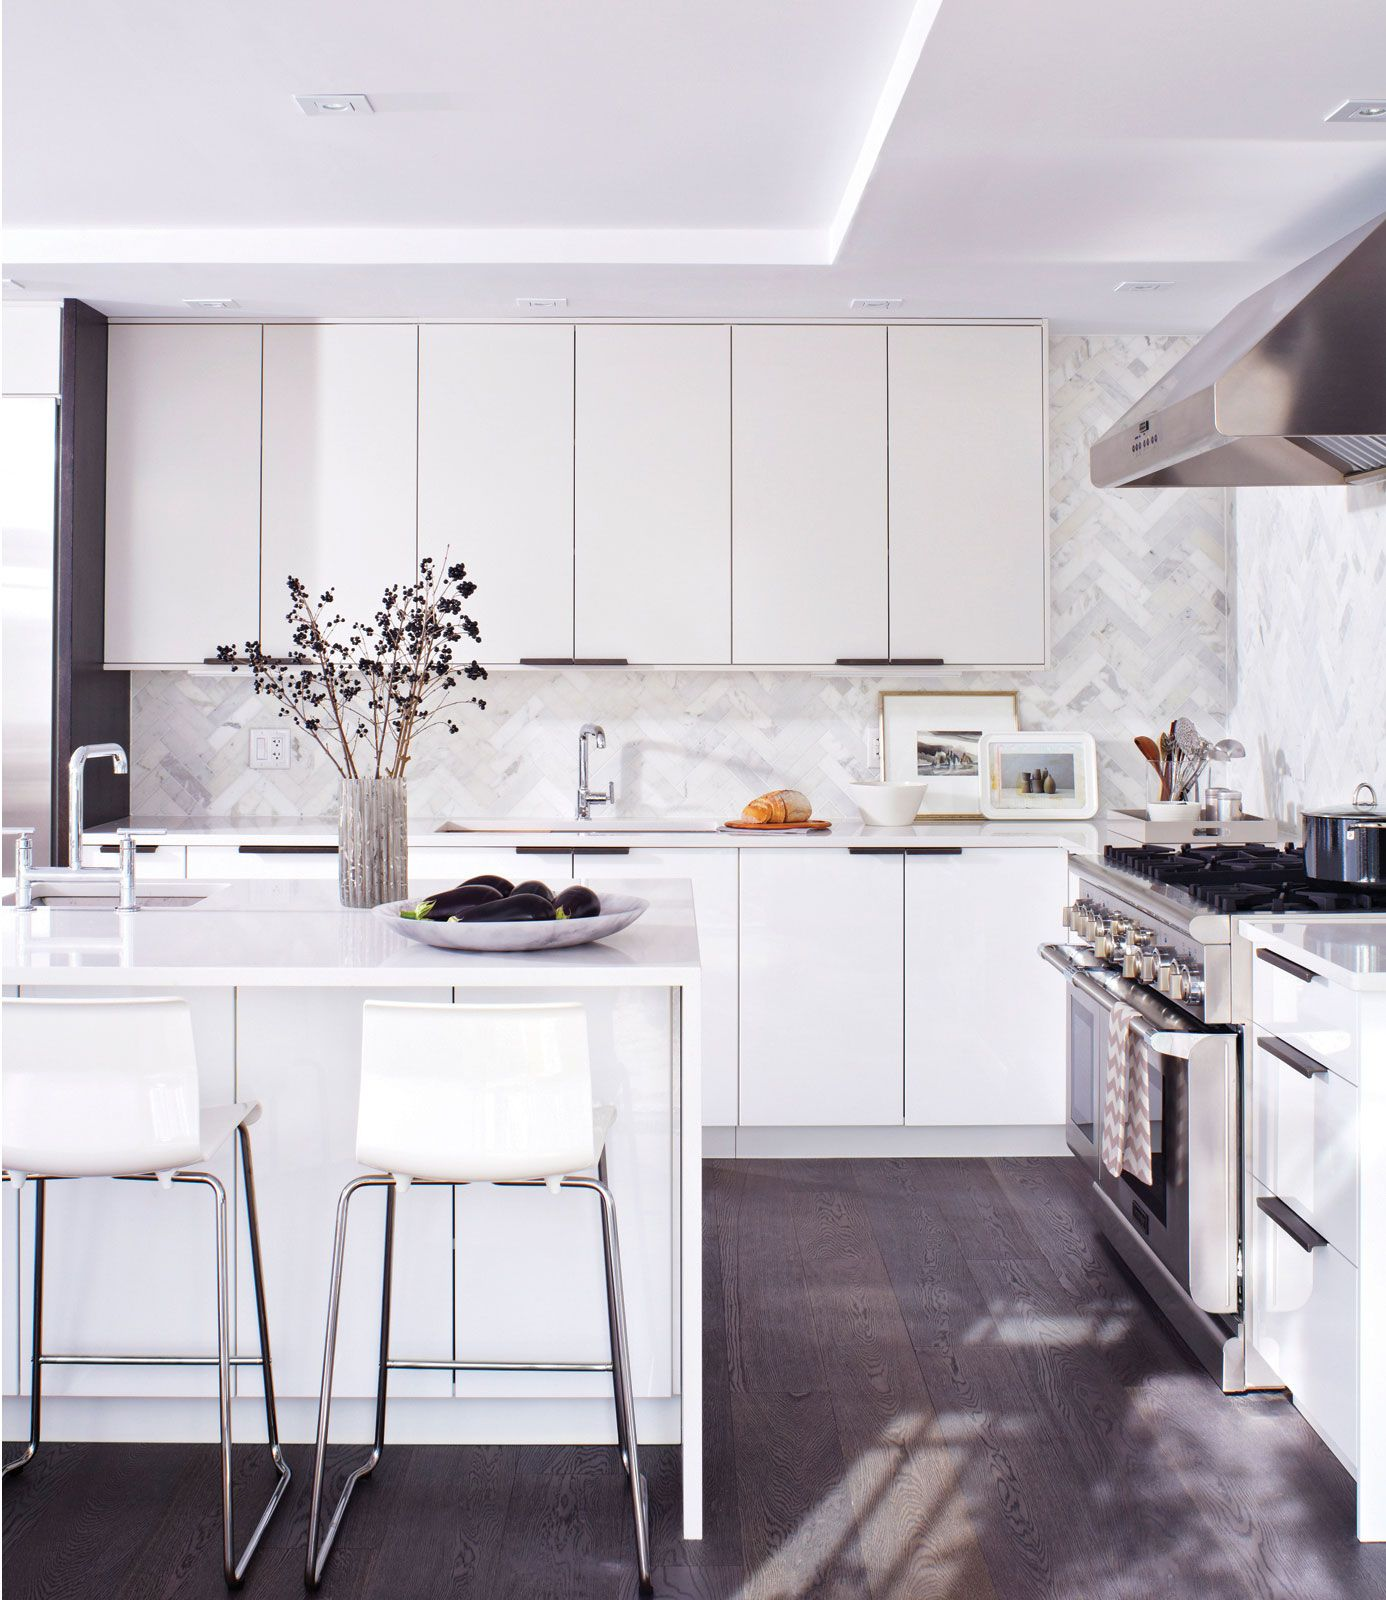 Ikea Kitchen Reno: Cabinet Hardware Gallery In 2019